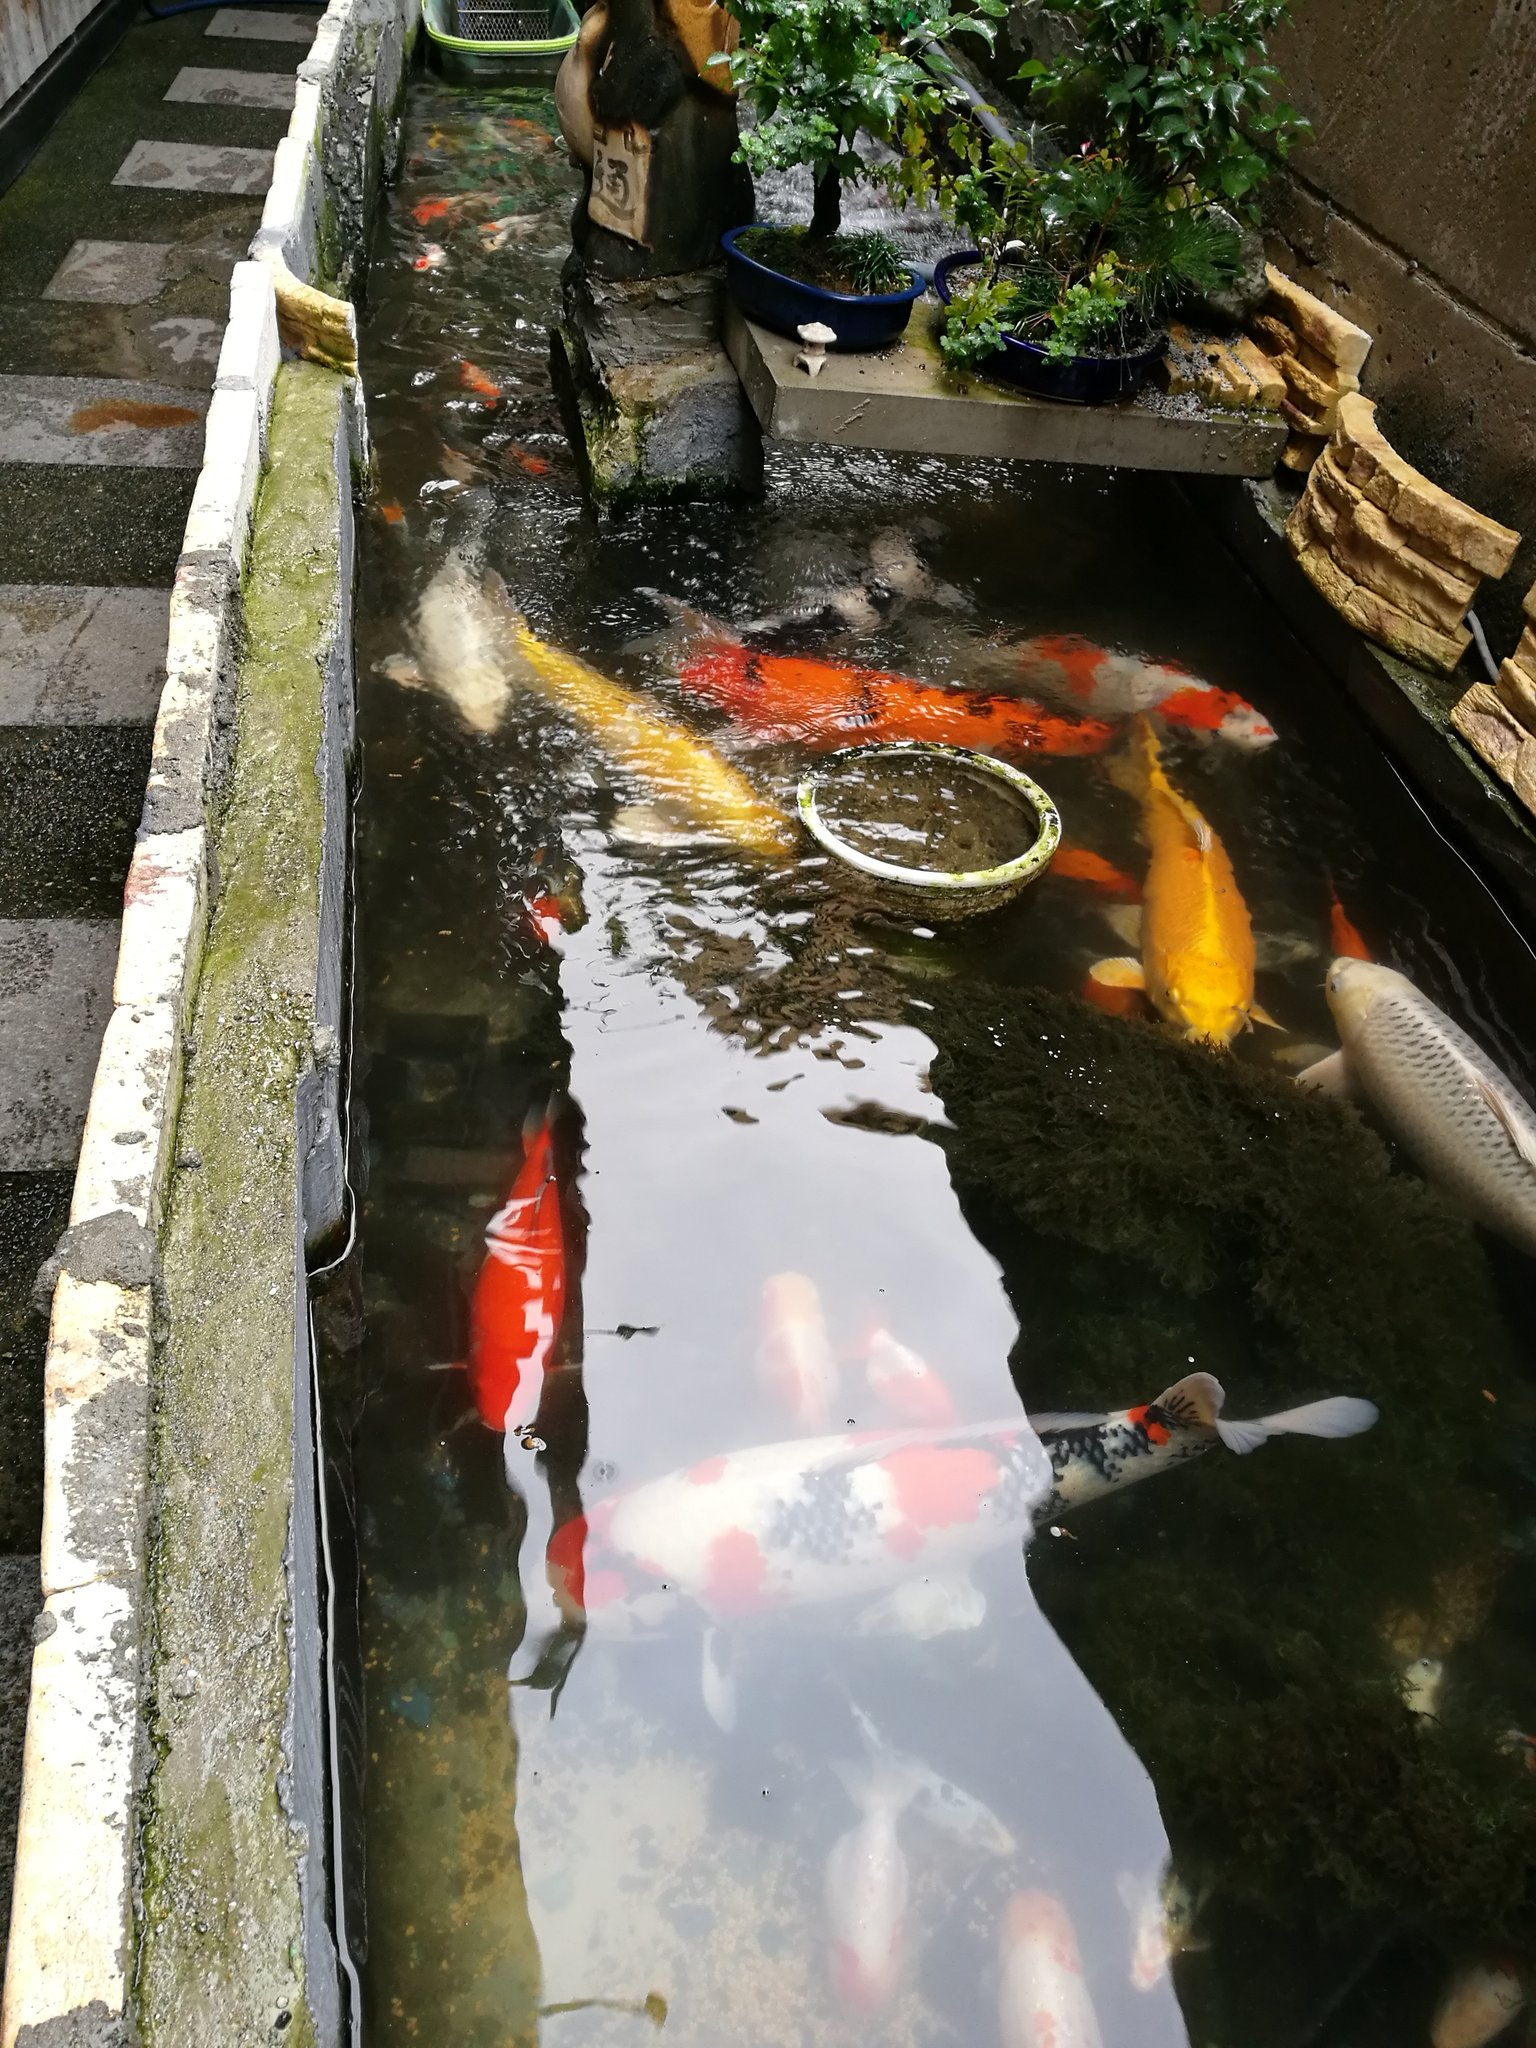 Fish in a lane. https://t.co/30v5uQz8ka